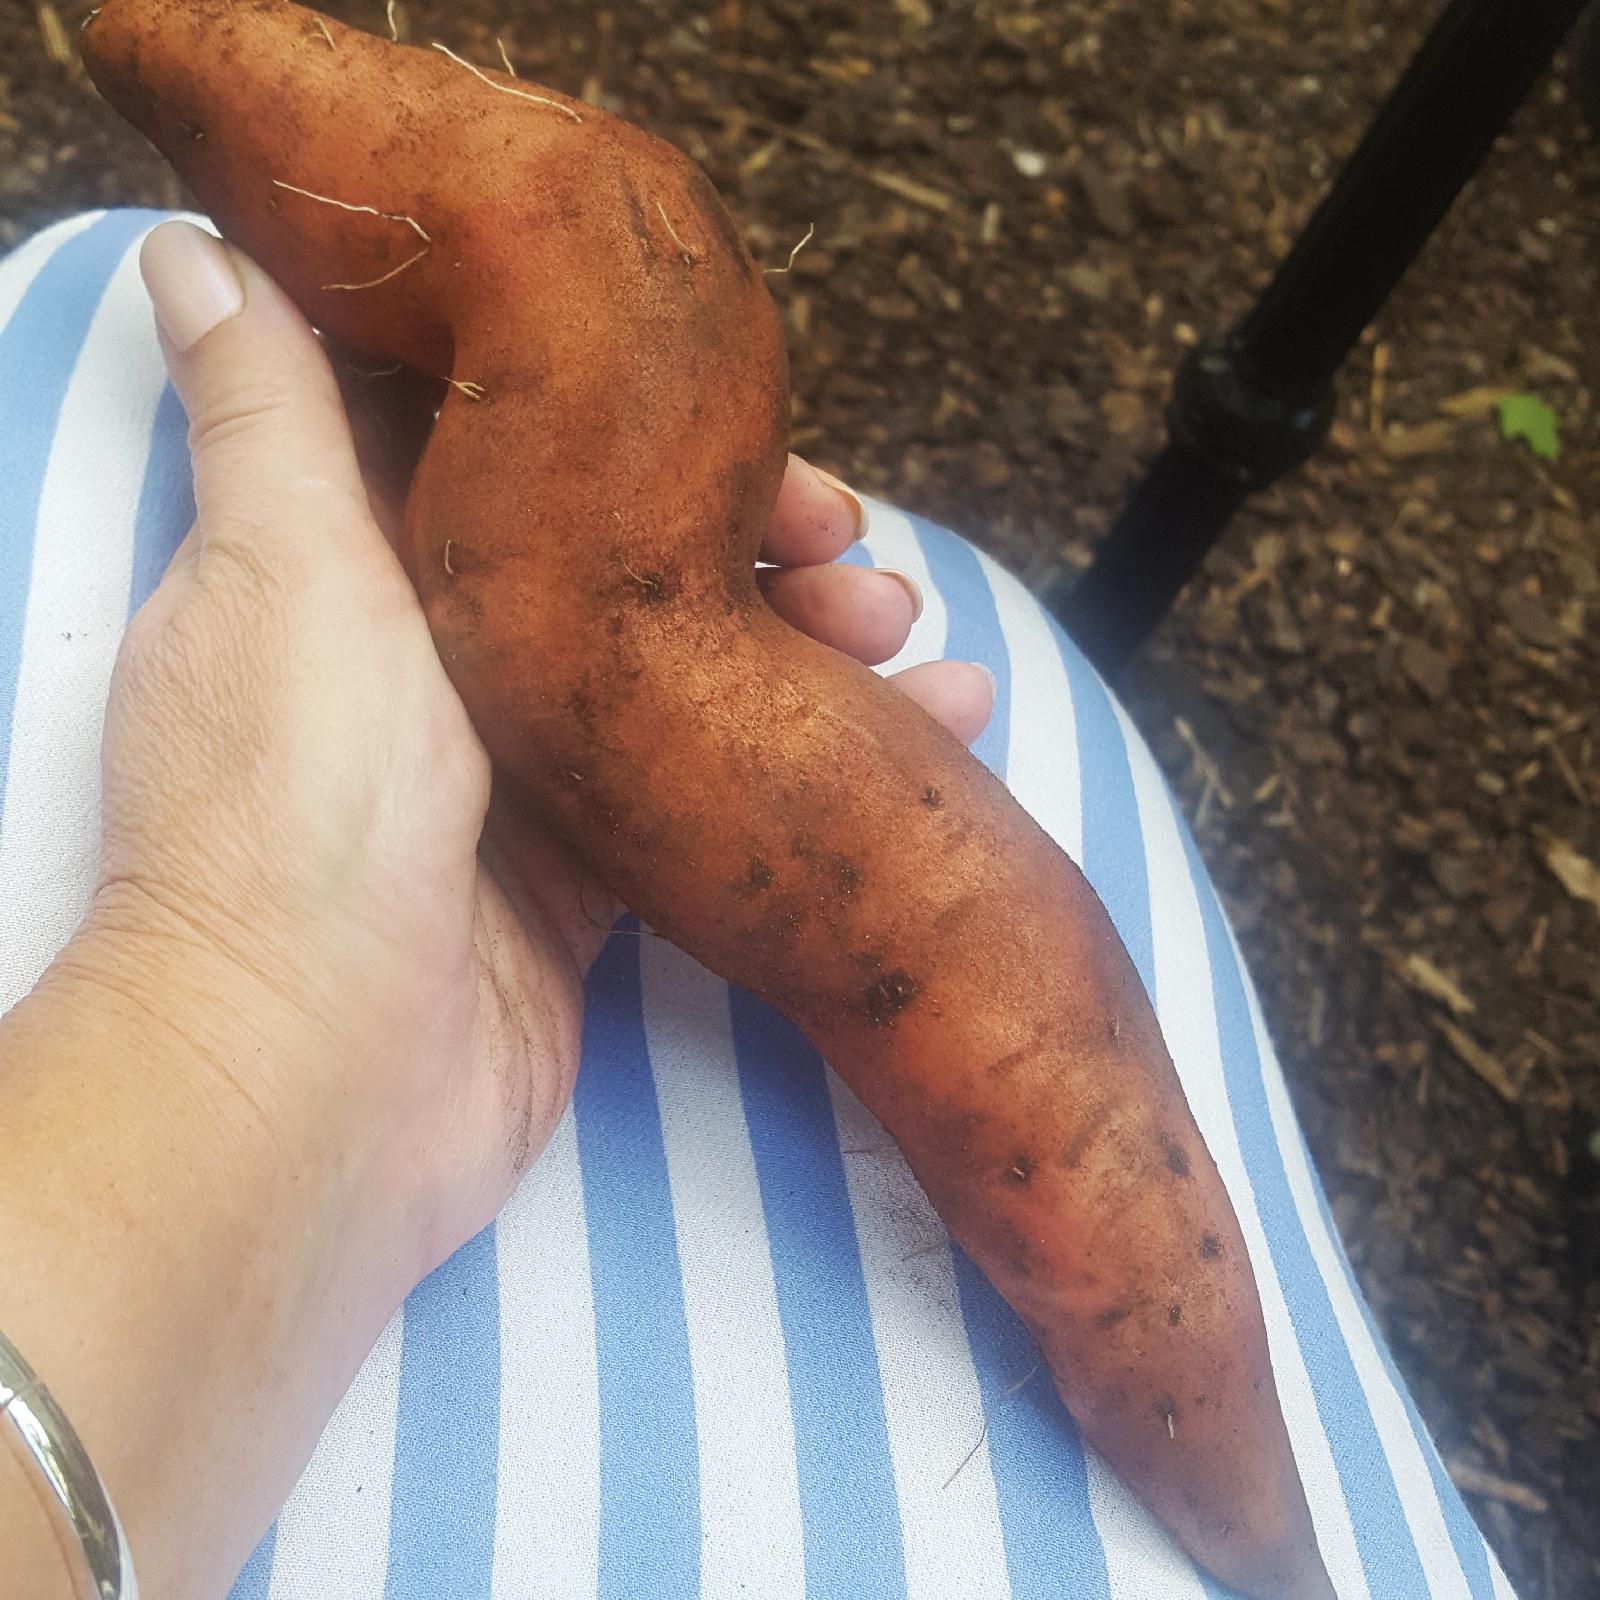 Süßkartoffeln aus dem Garten.